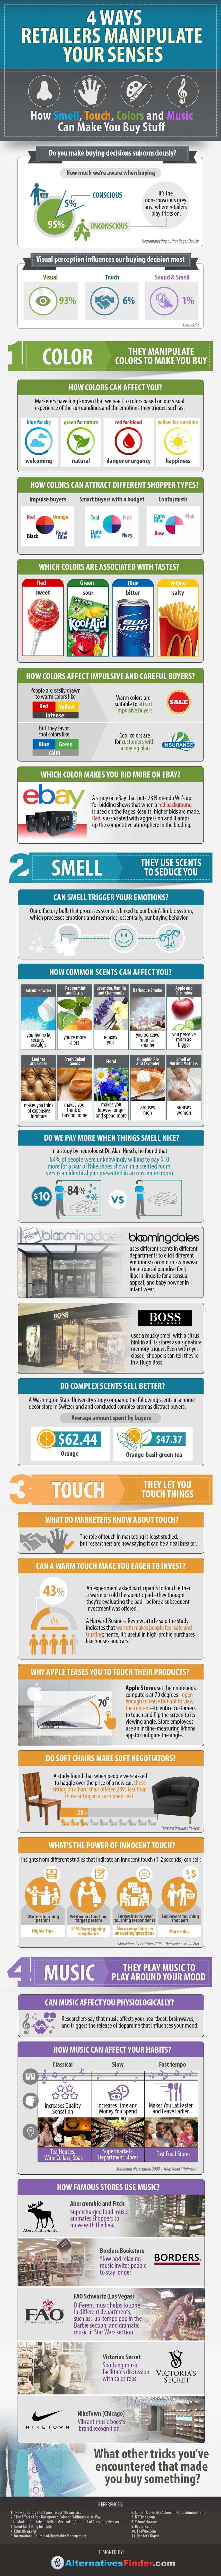 infografia retailer sentidos